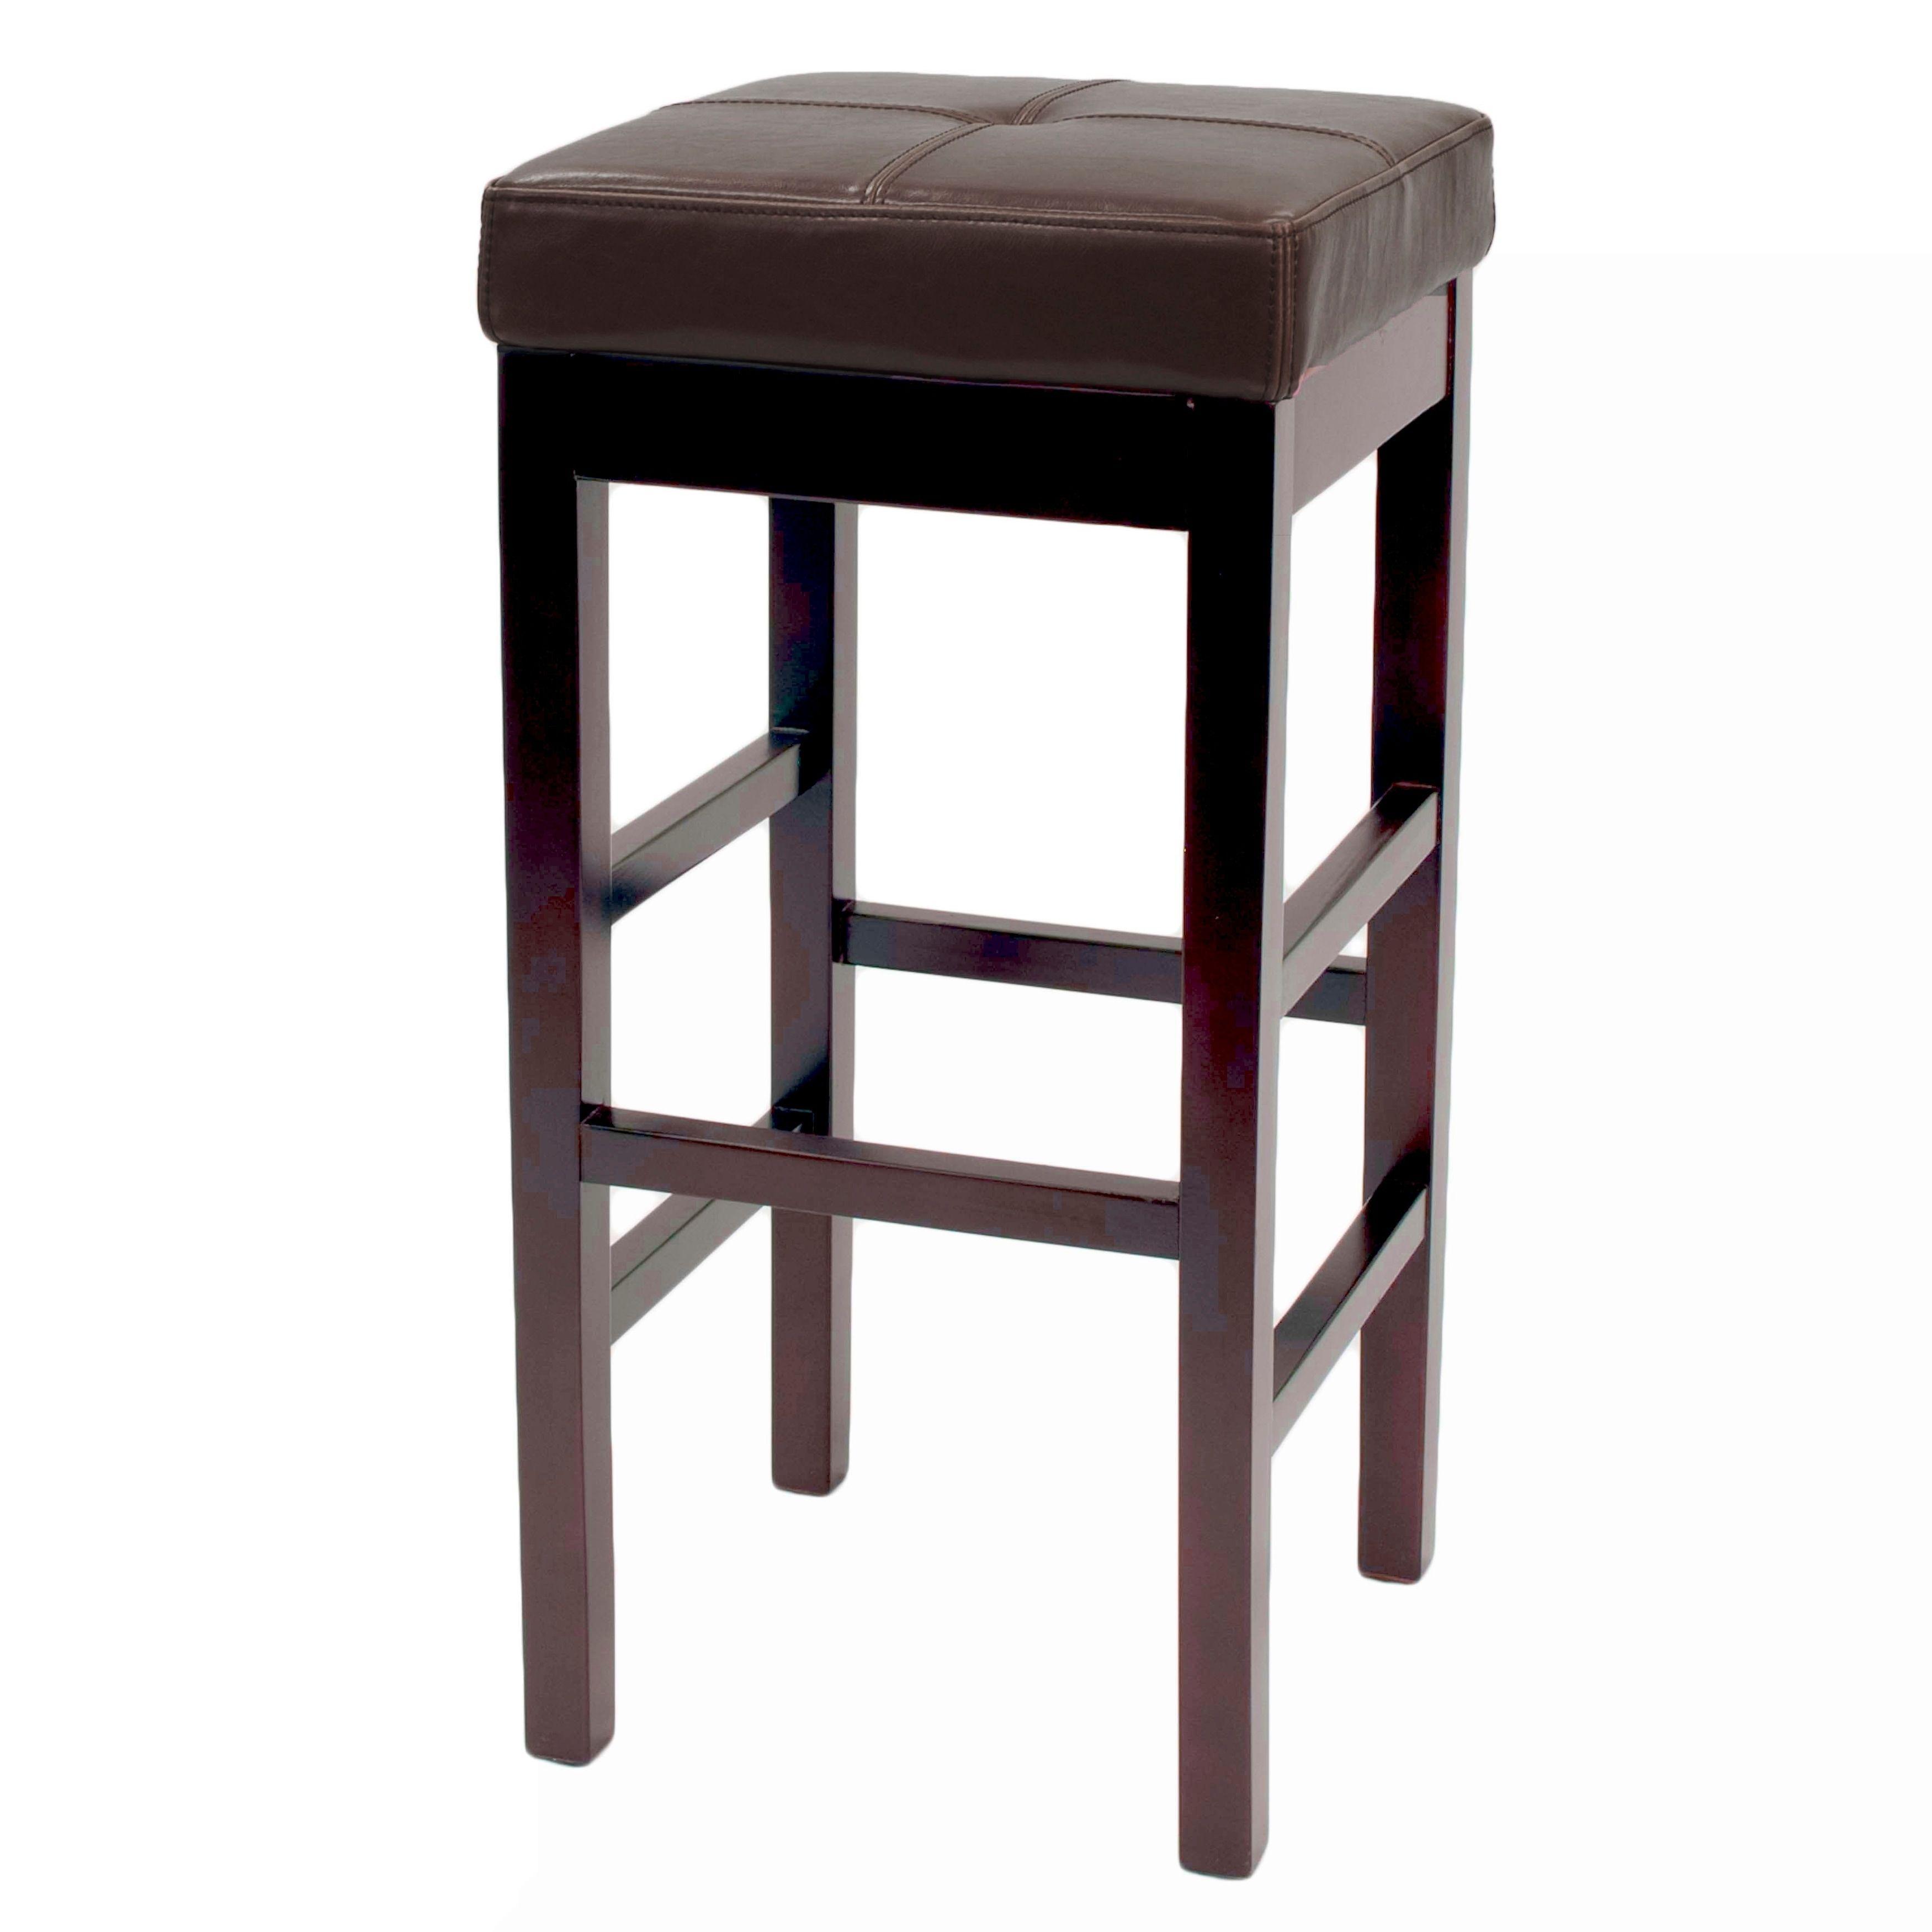 Fine Copper Grove Valencia Backless Leather Square Bar Stool Machost Co Dining Chair Design Ideas Machostcouk